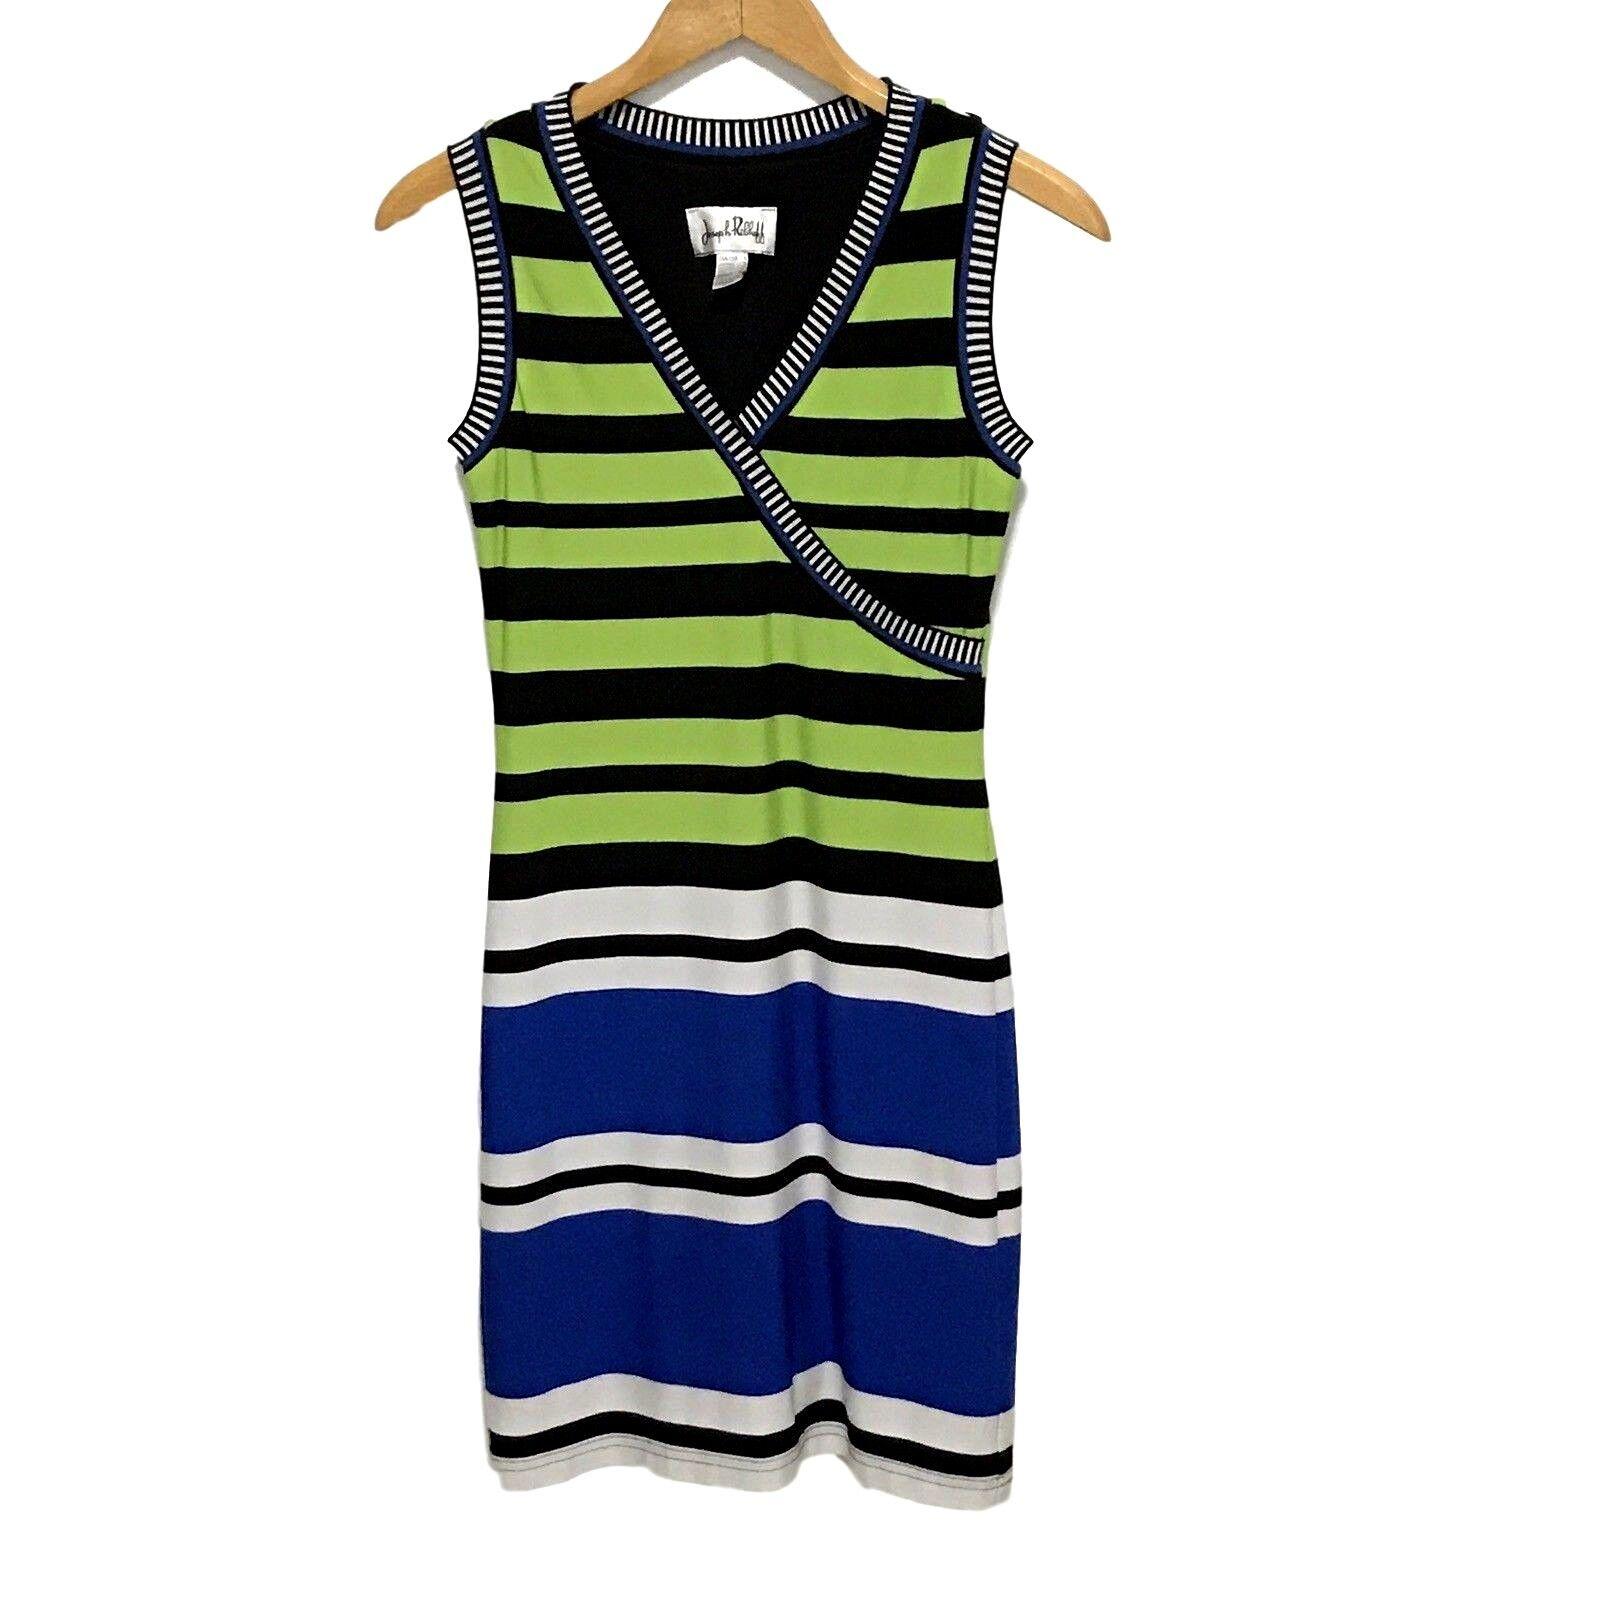 Joseph Ribkoff Dress damen Größe 6 Multi-Farbe Stripes Sleeveless Stretch